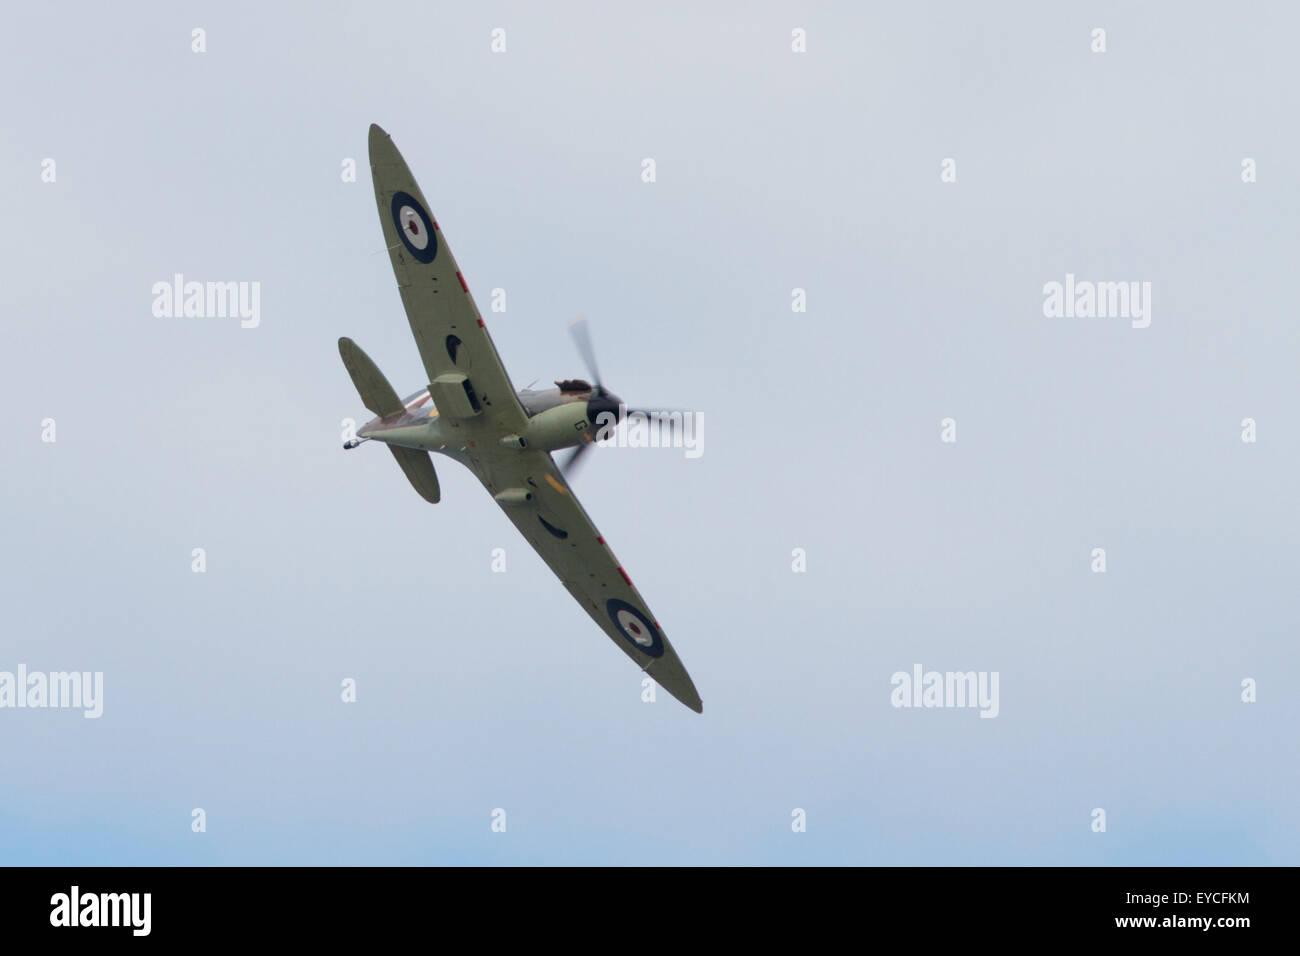 Sunderland, UK. 25th July, 2015. WW2 Spitfire flying at the Sunderland Airshow, July 2015 Credit:  Robert Cole/Alamy - Stock Image